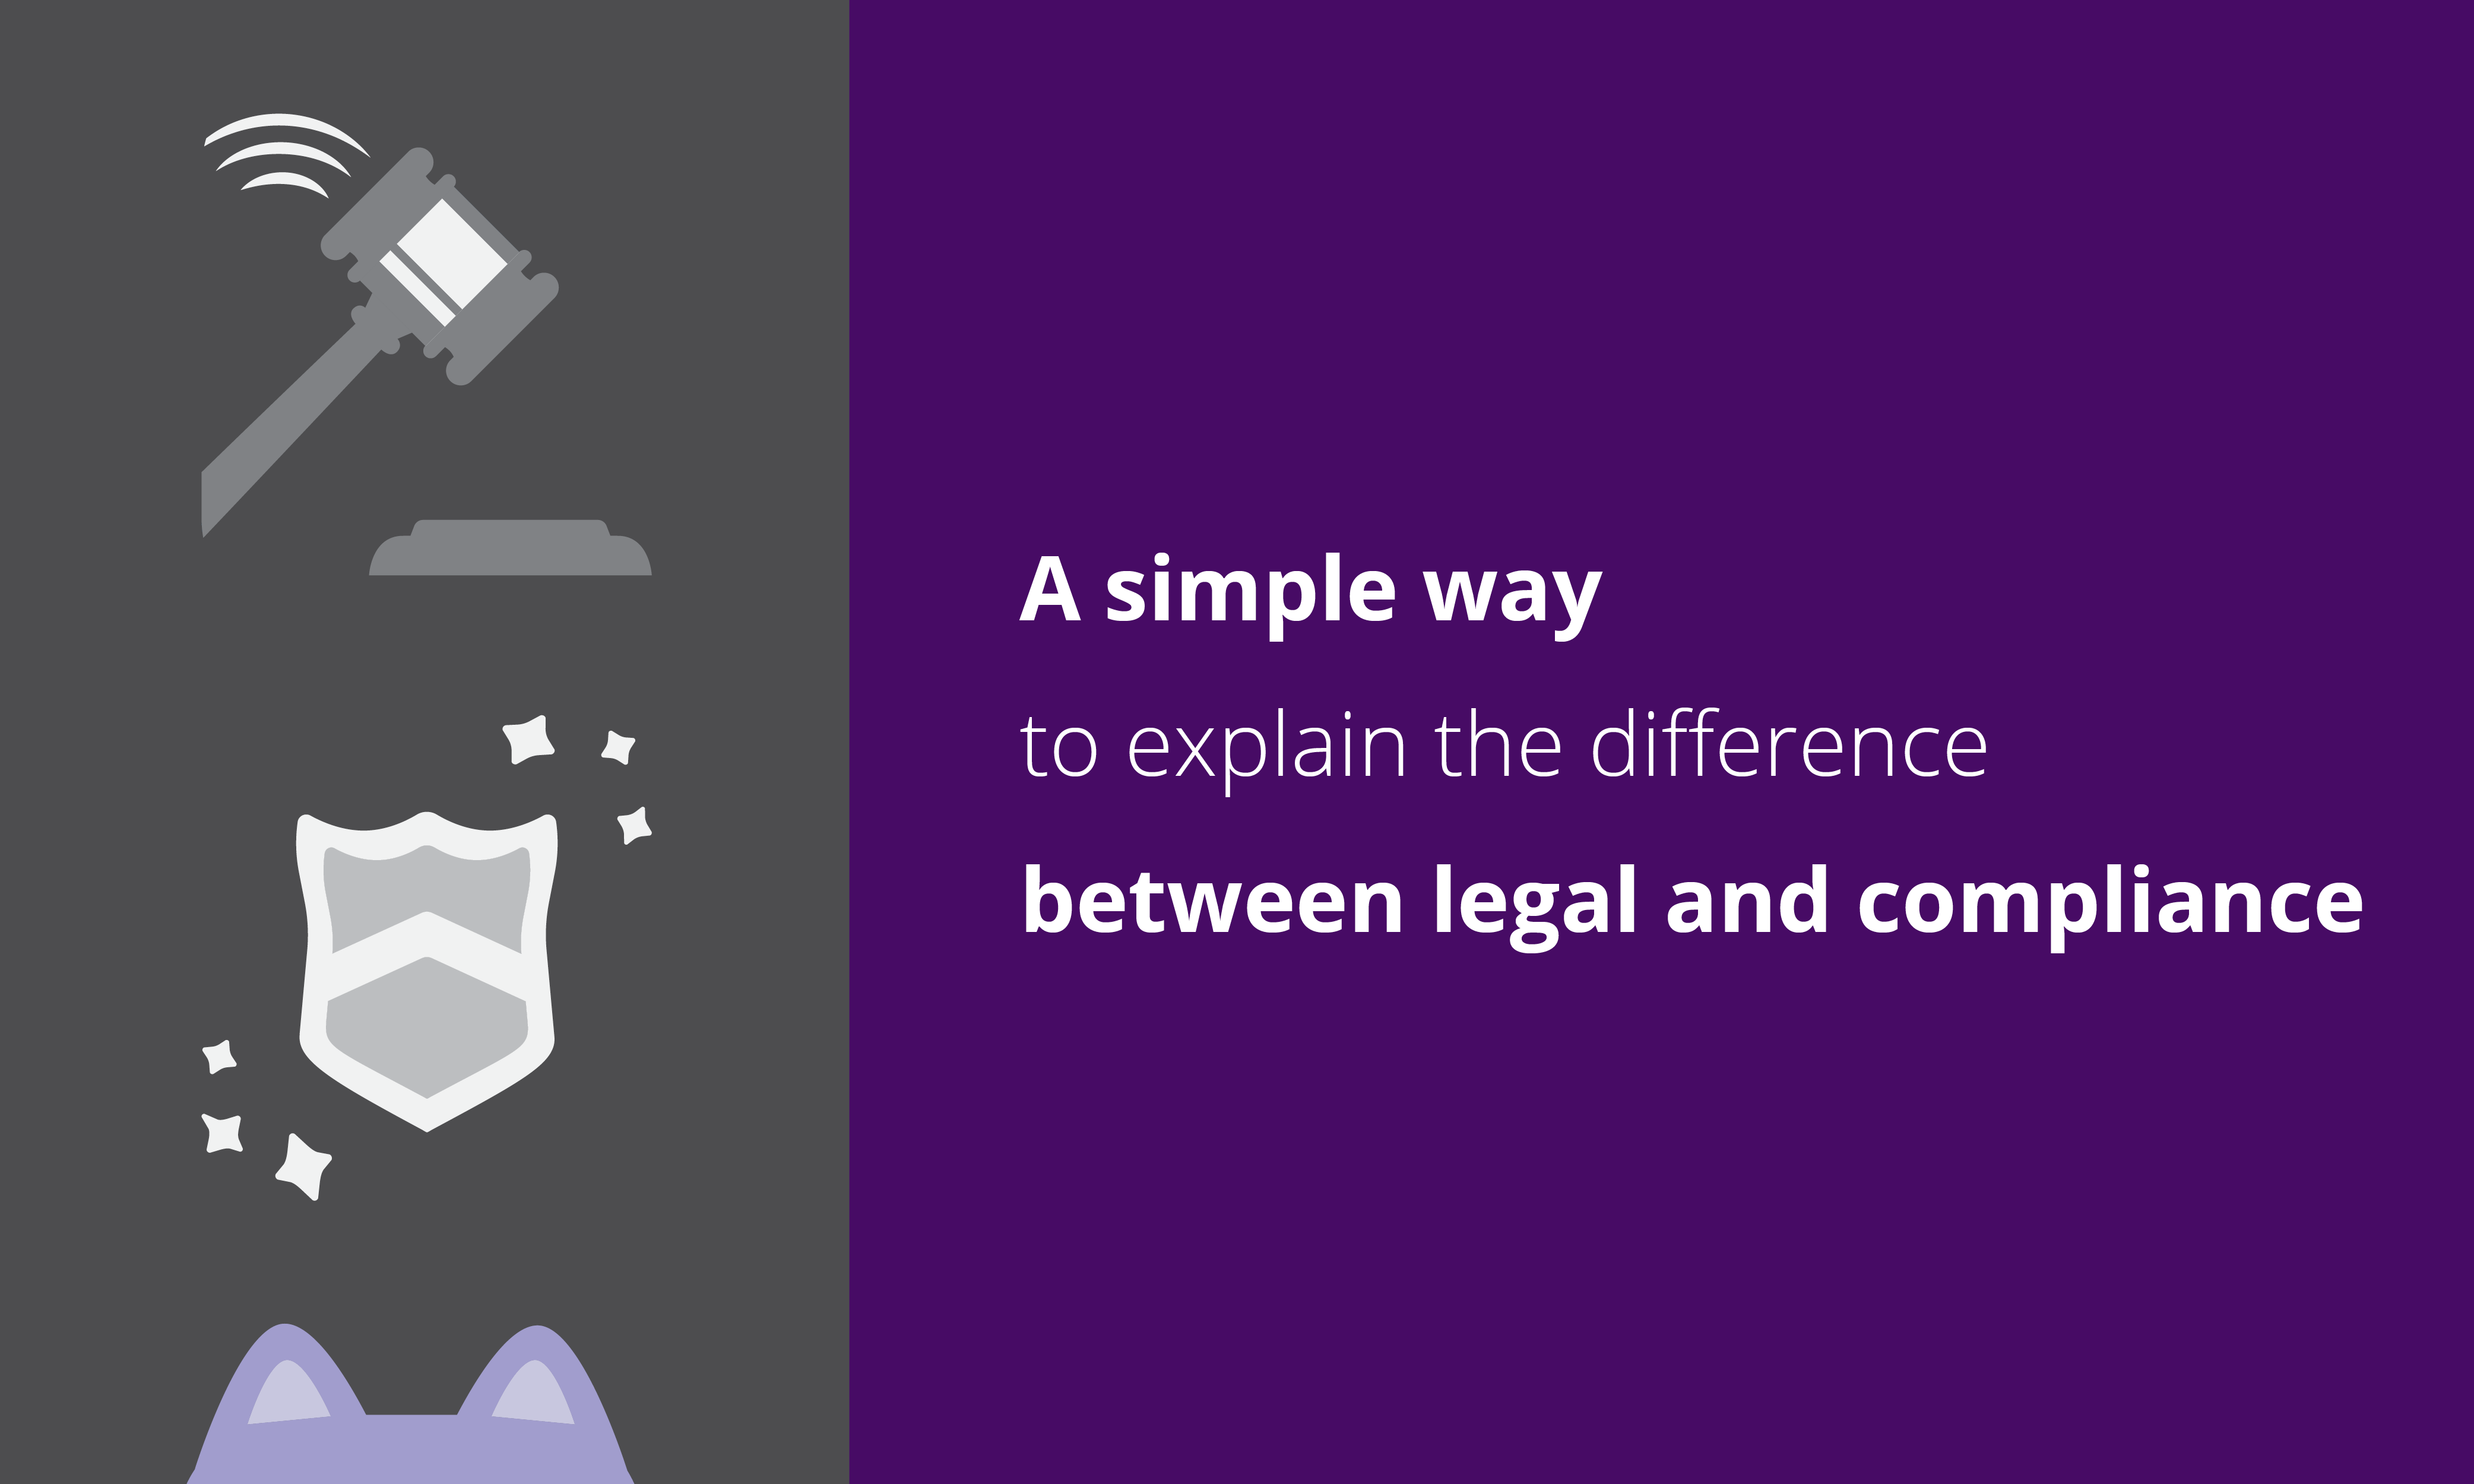 Legal-vs-compliance-analogy-blog-2